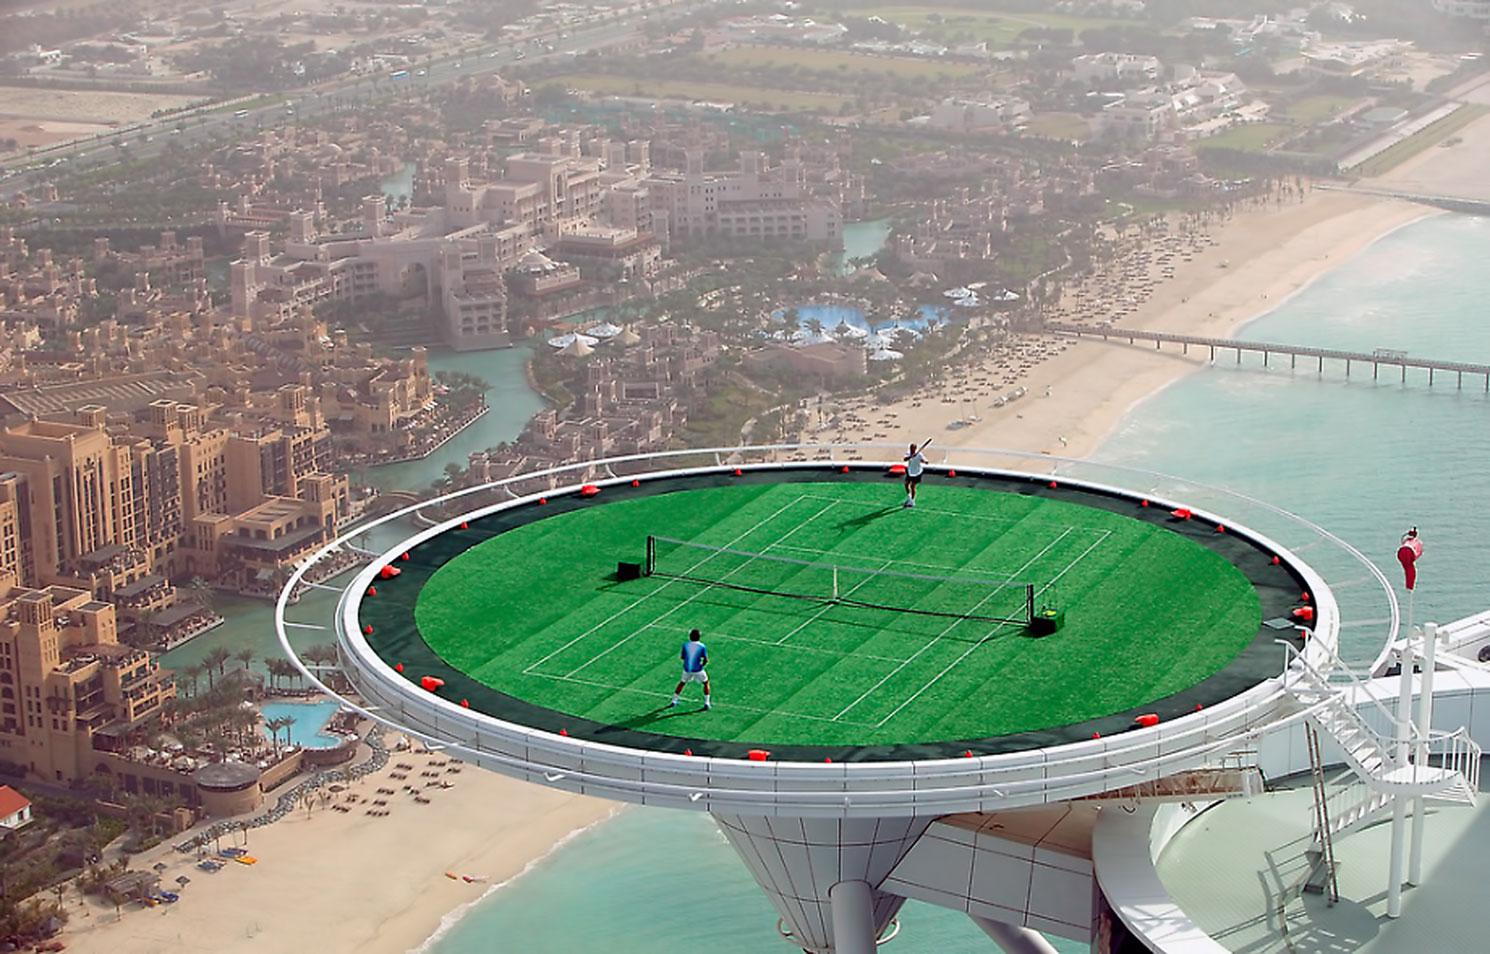 burj-al-arab-helikopterlandeplatz-tennis